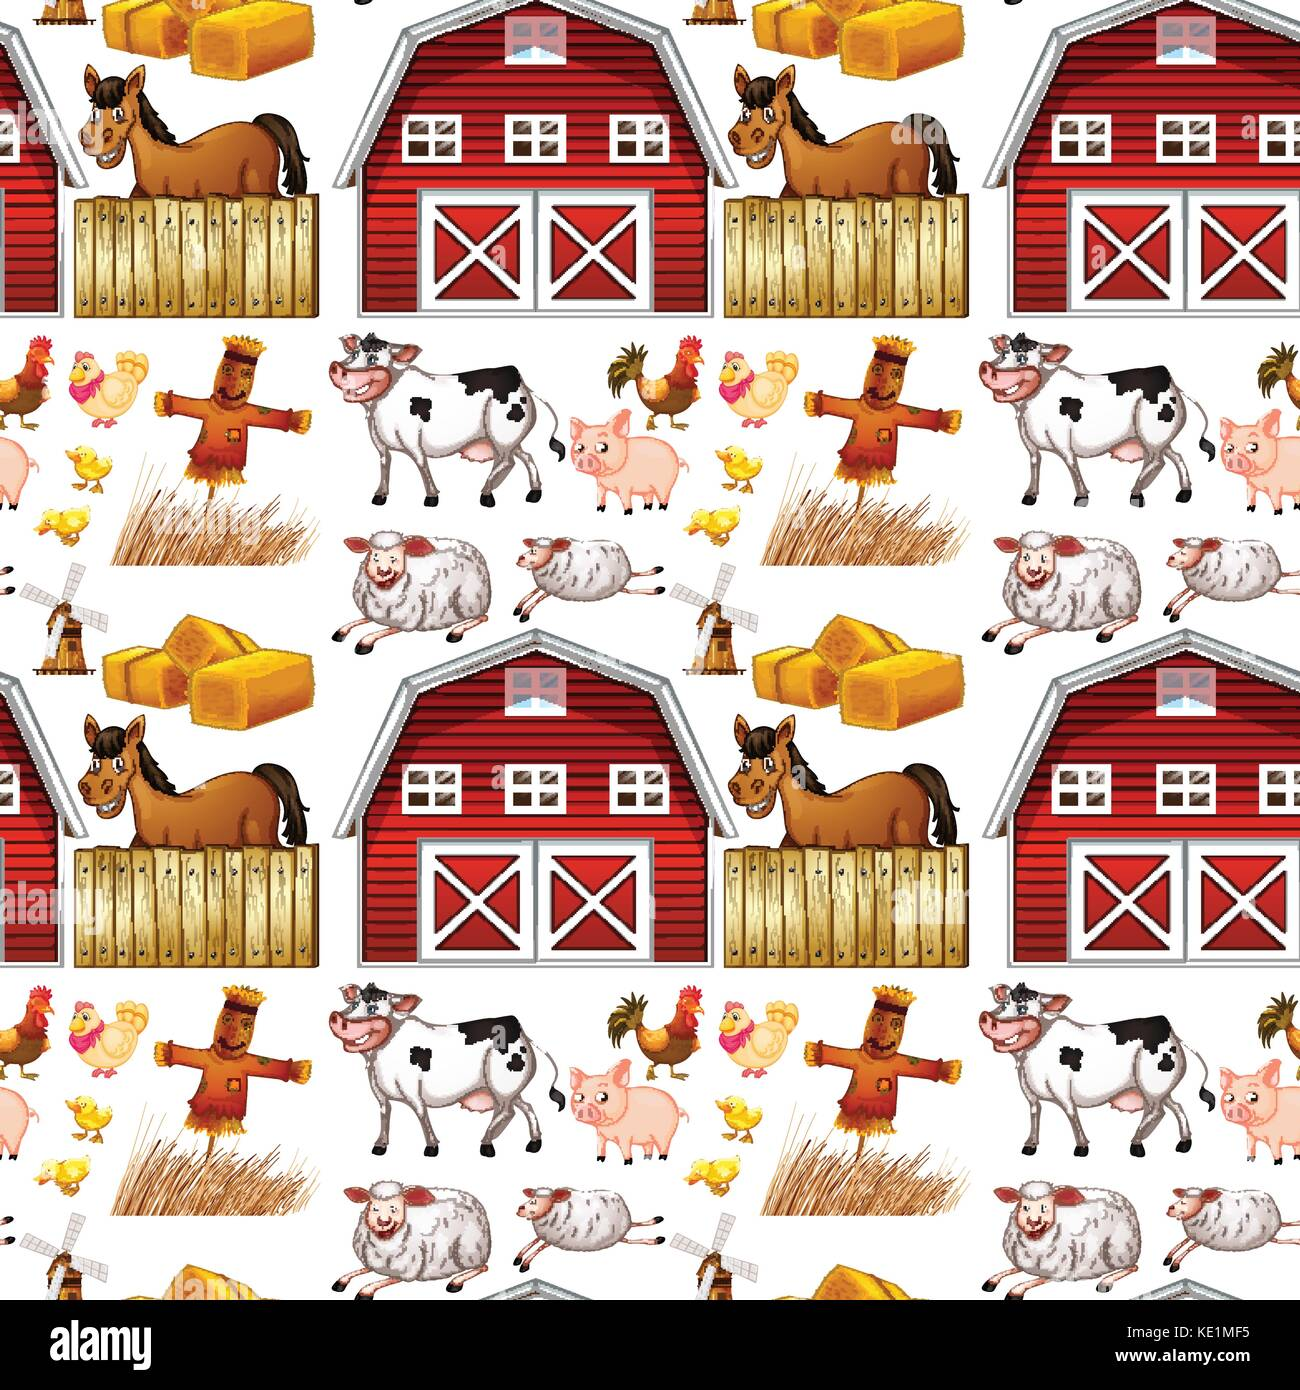 Seamless Farm Animals And Red Barn Illustration